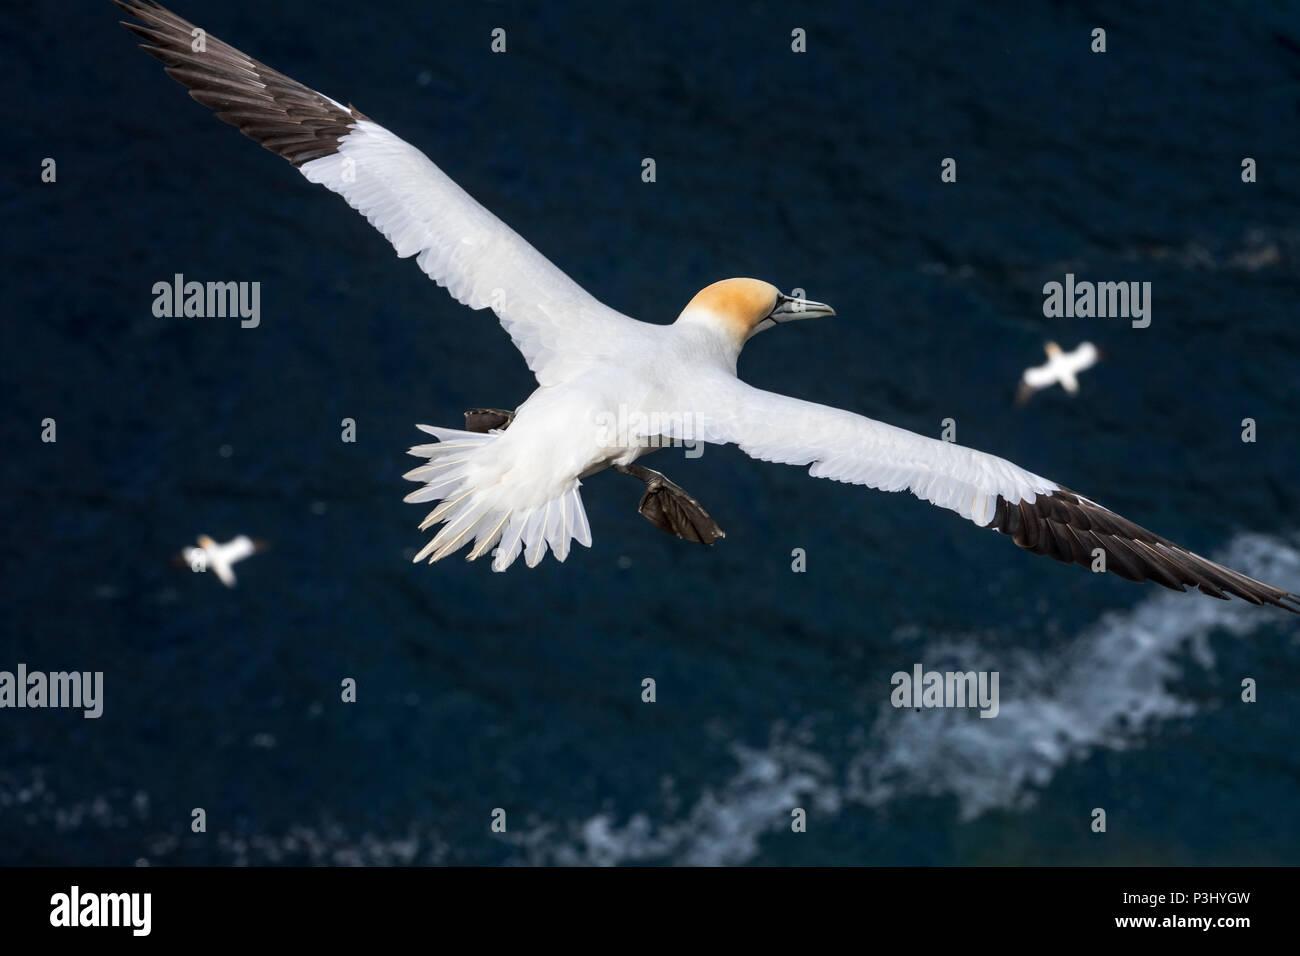 Northern gannets (Morus bassanus) in flight soaring over water of the Atlantic Ocean - Stock Image